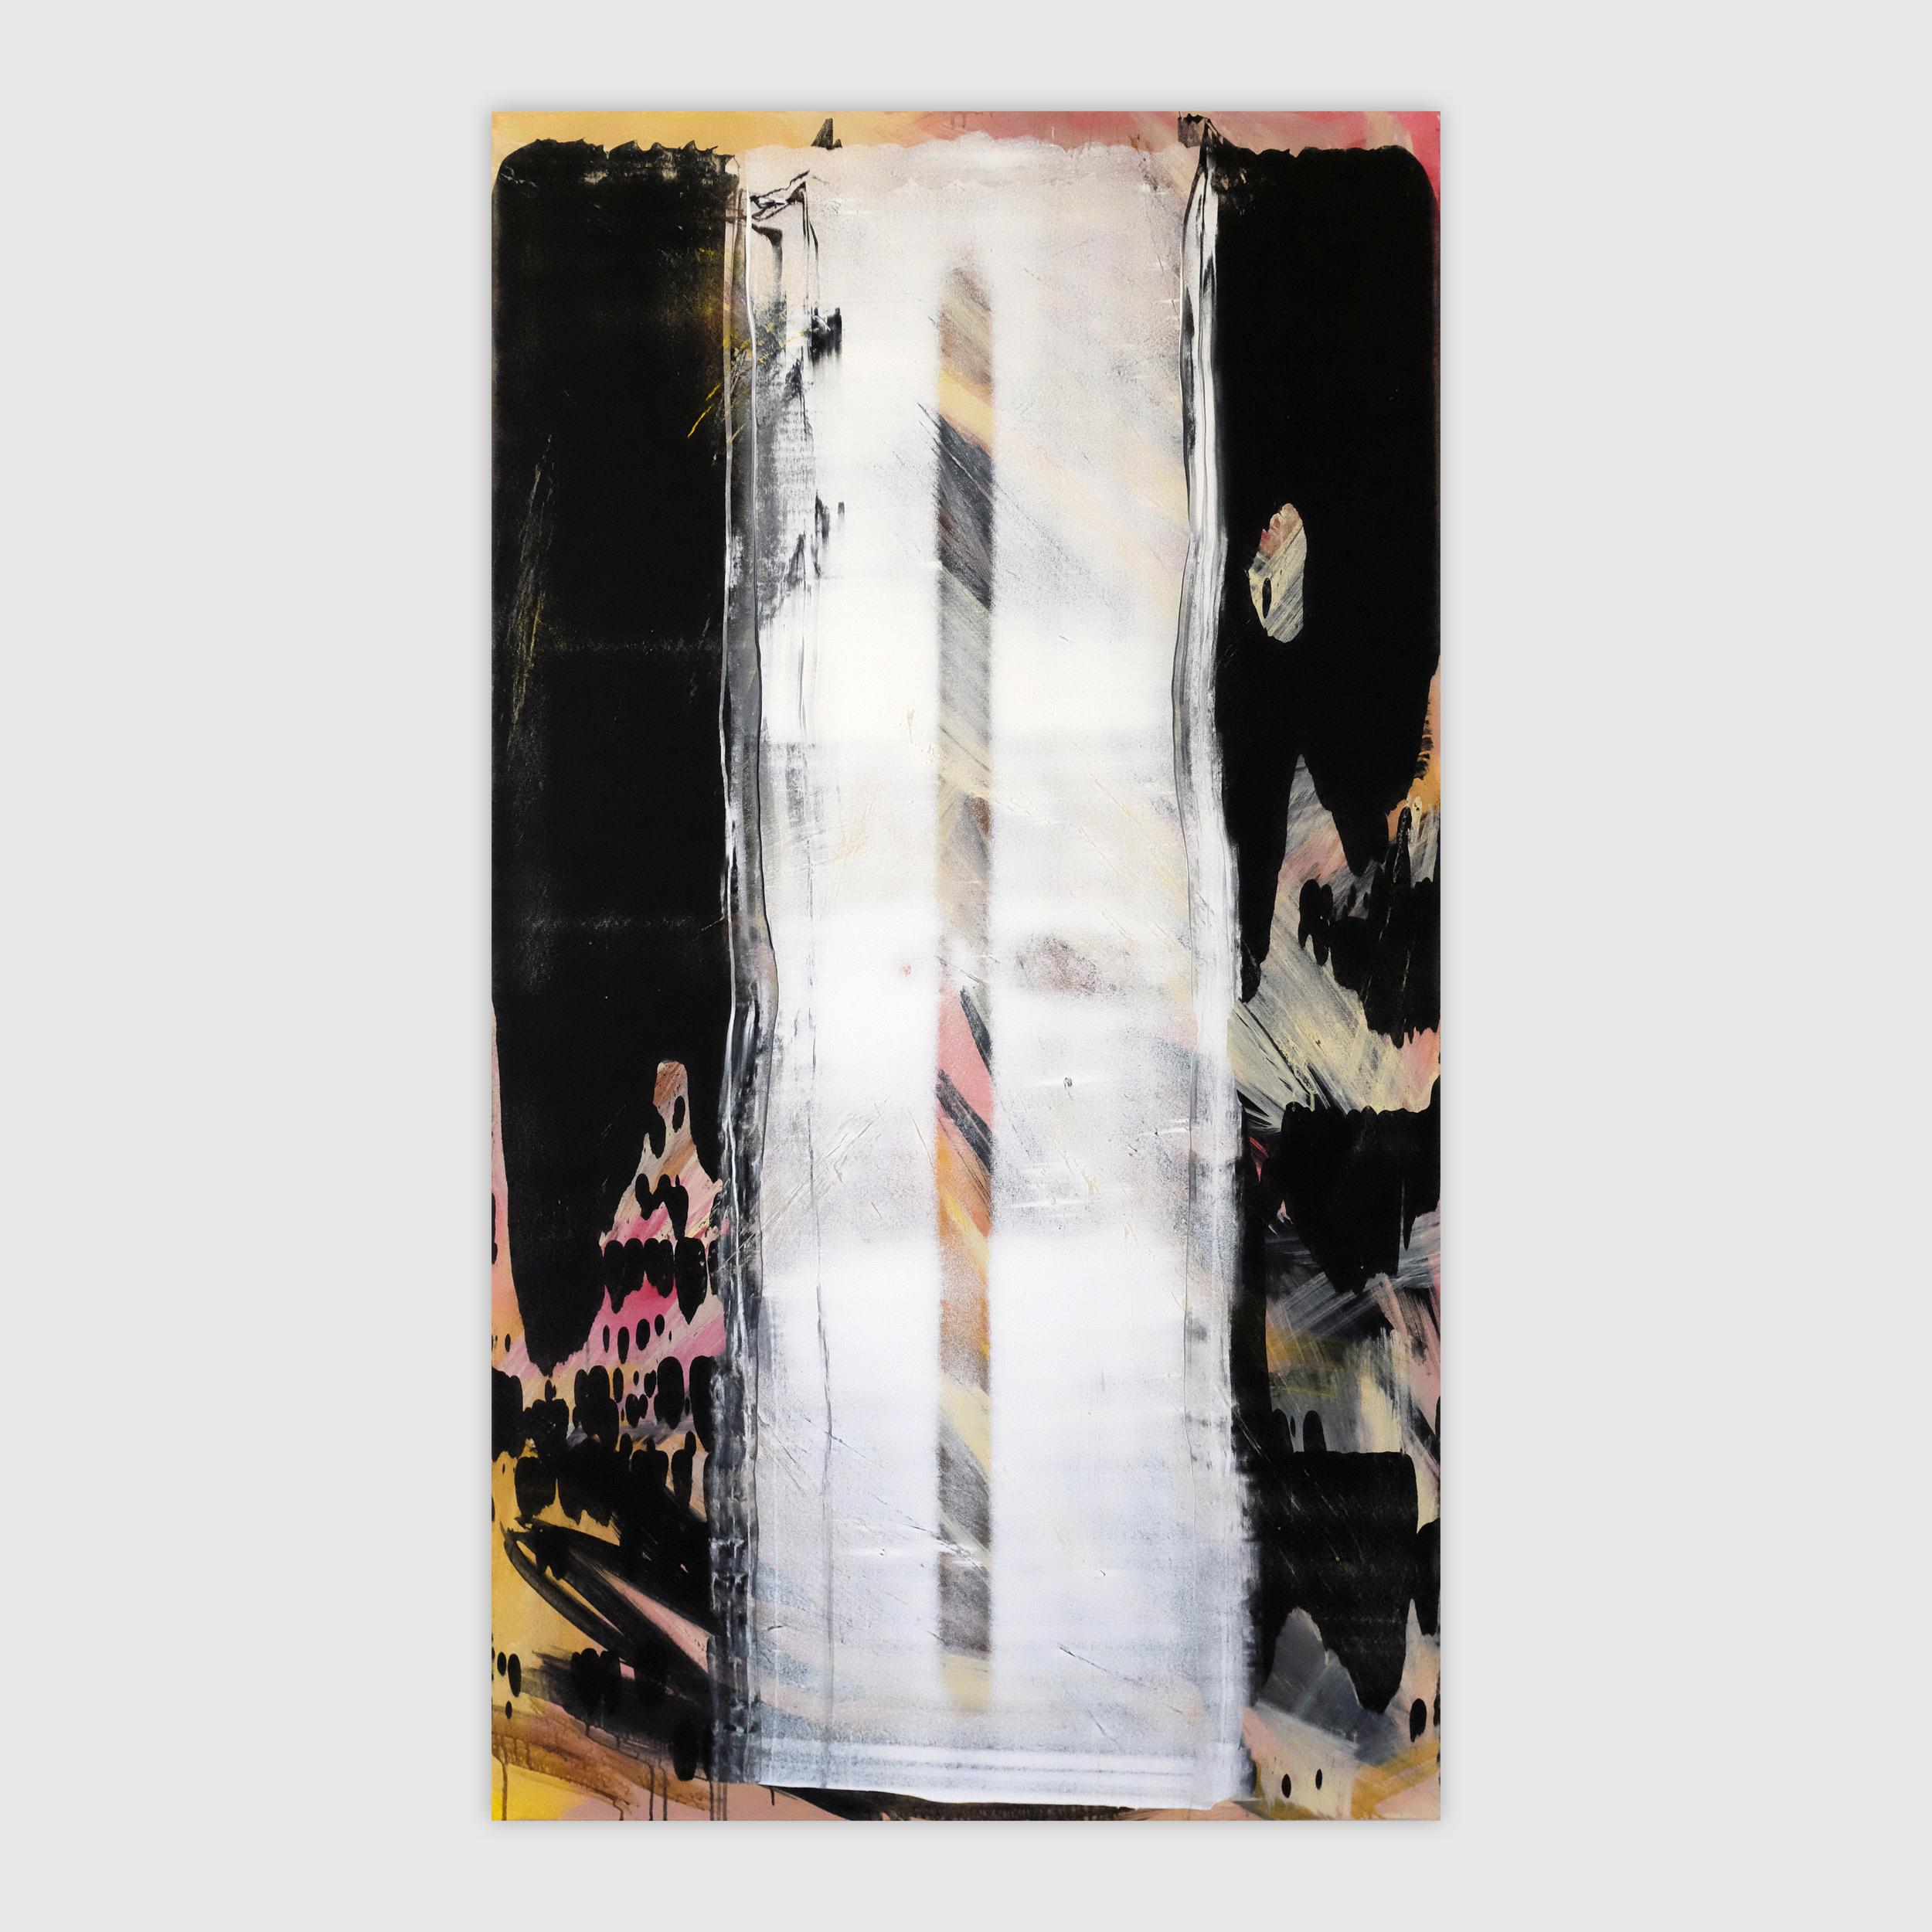 Untitled, 2015